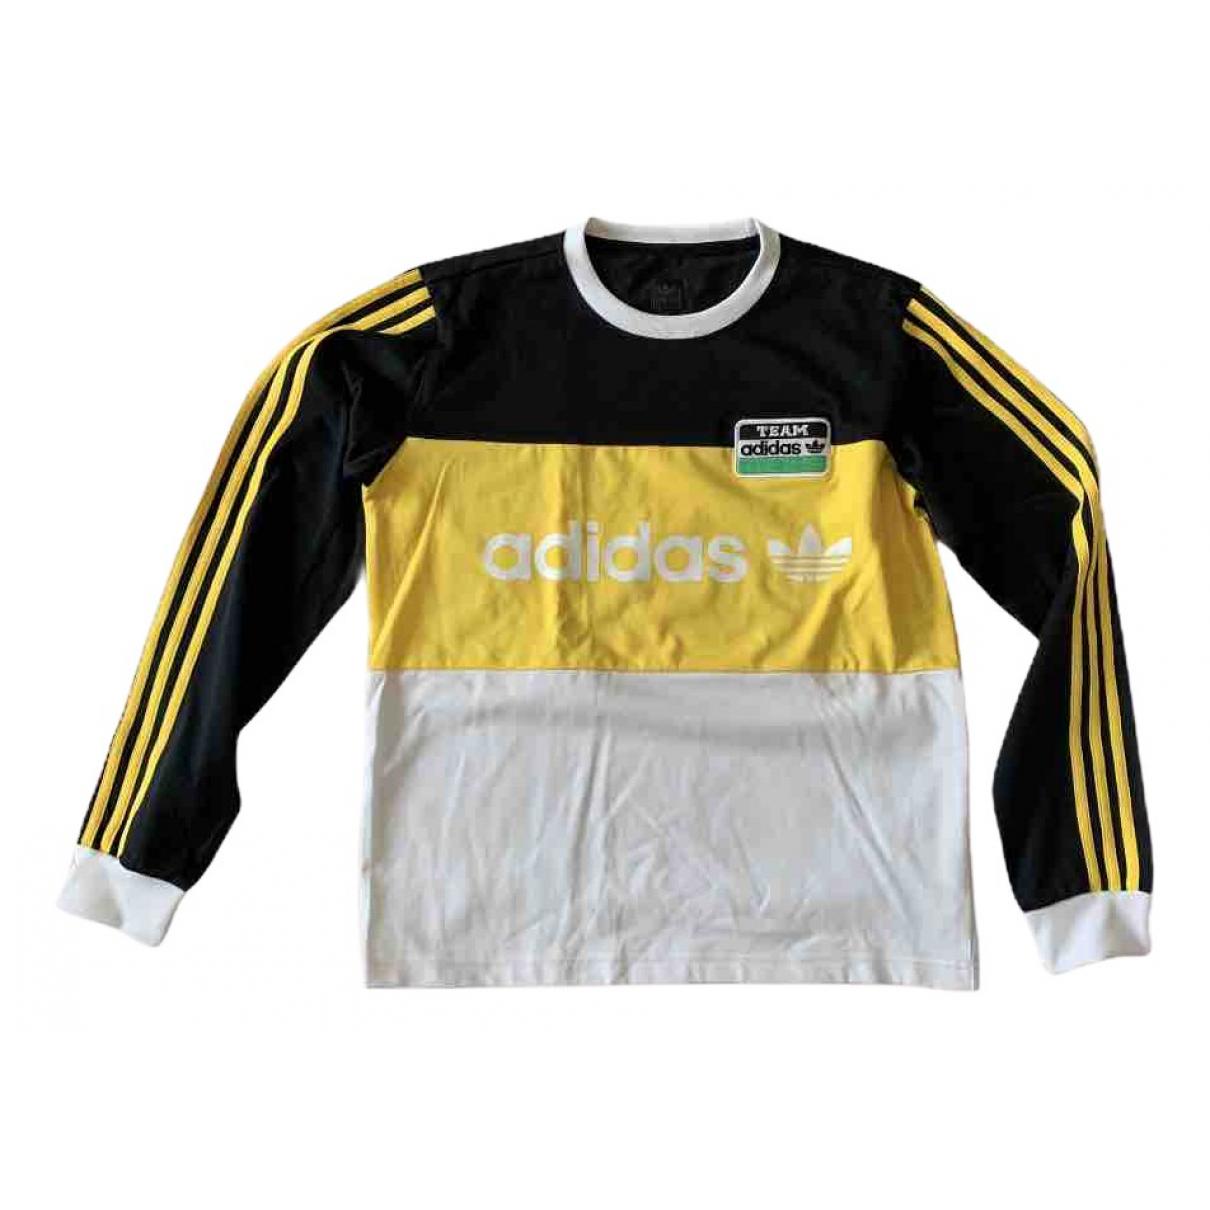 Adidas \N Multicolour Cotton Knitwear & Sweatshirts for Men M International